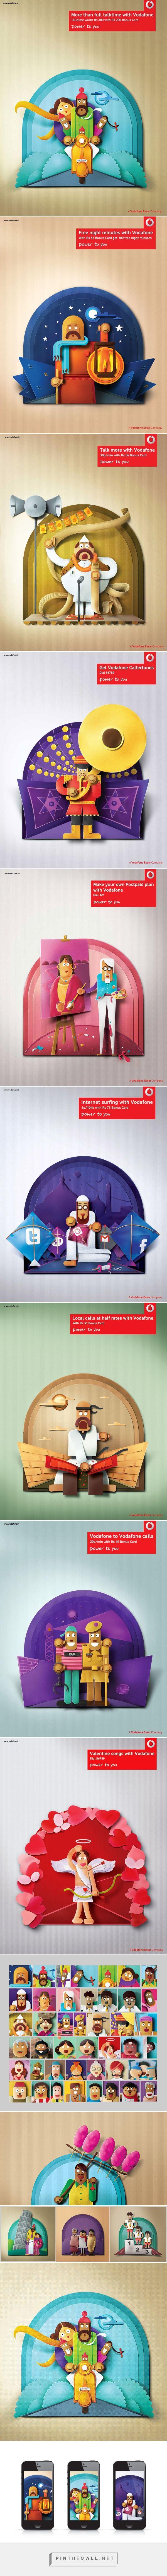 Vodafone India on Behance - created via http://pinthemall.net